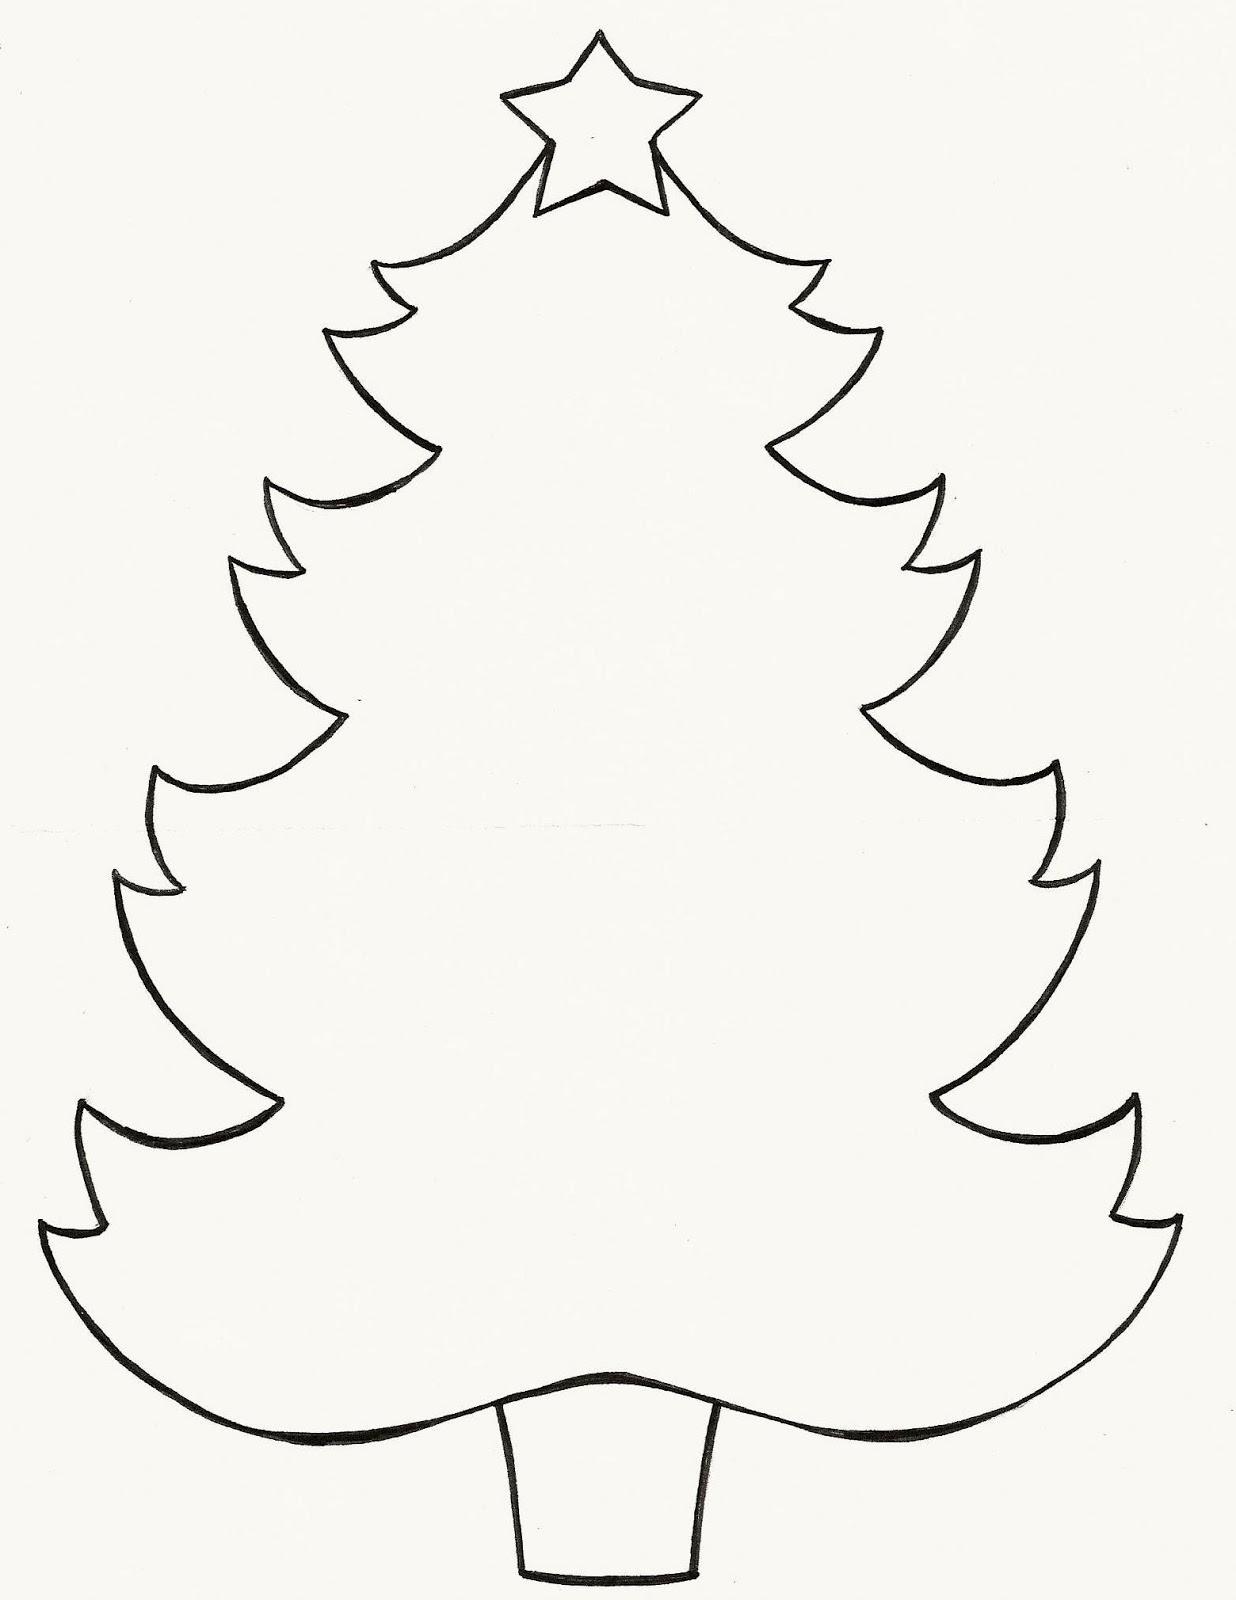 1236x1600 Drawn Pine Tree Line Drawing